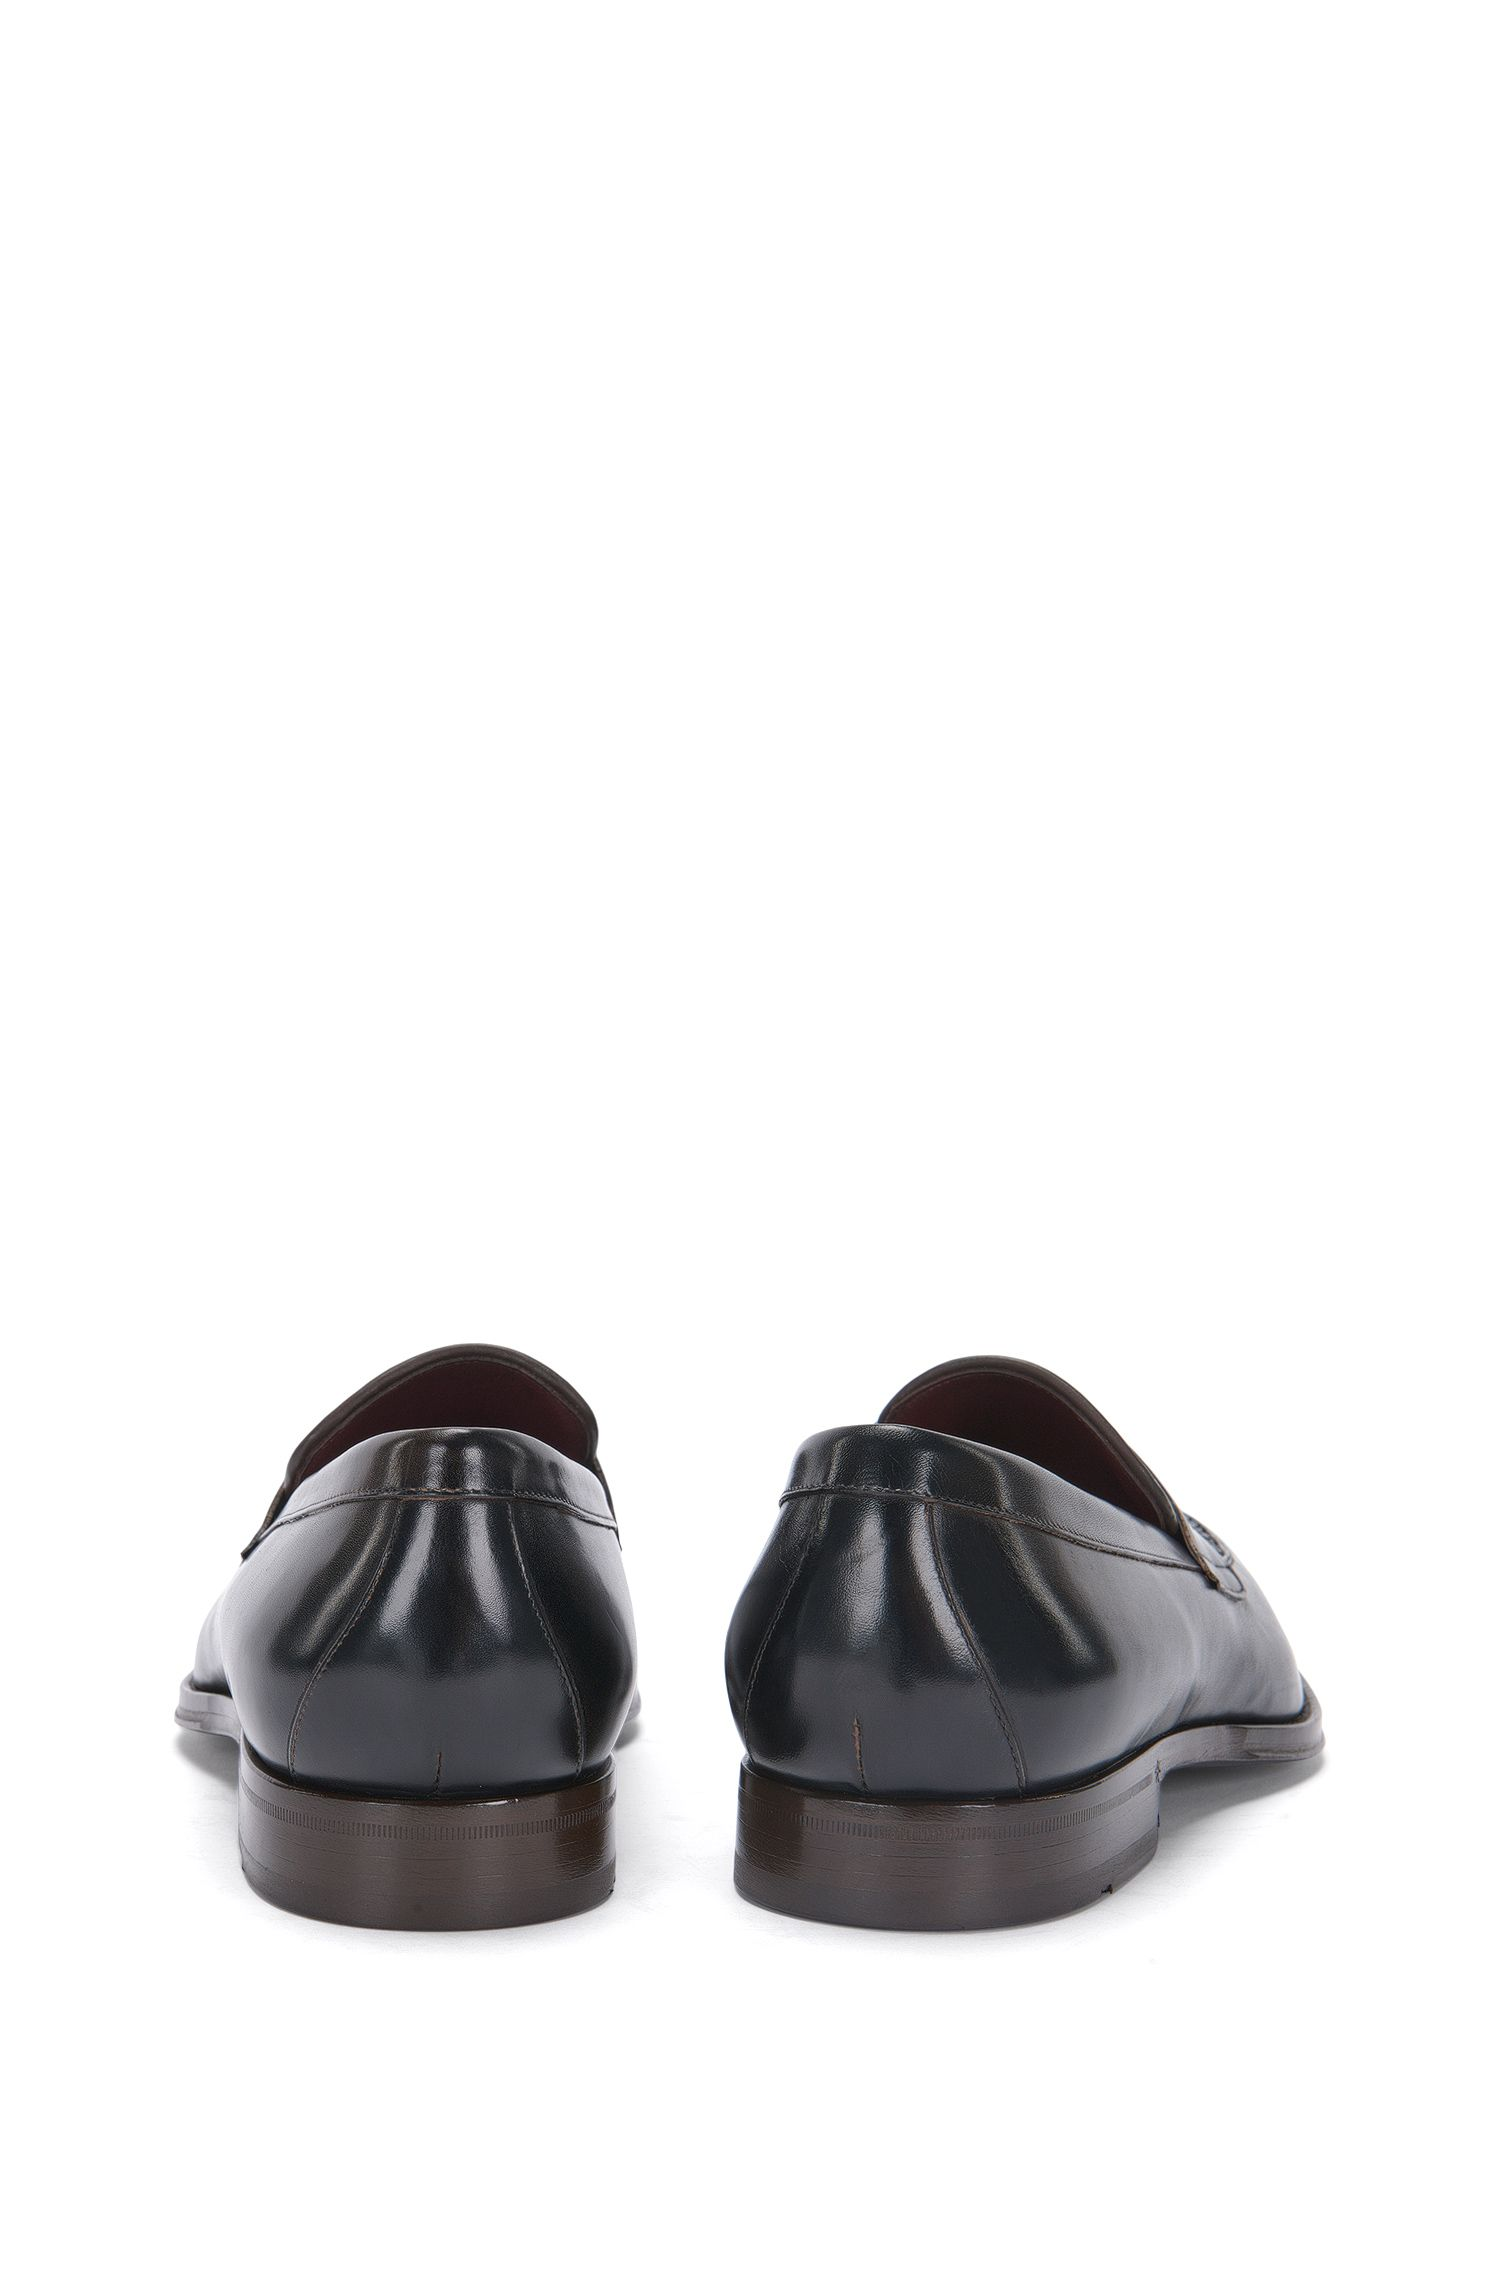 Tailored Loafer aus Leder mit Partien in Flecht-Struktur: 'T-Idol_Loaf_woap'